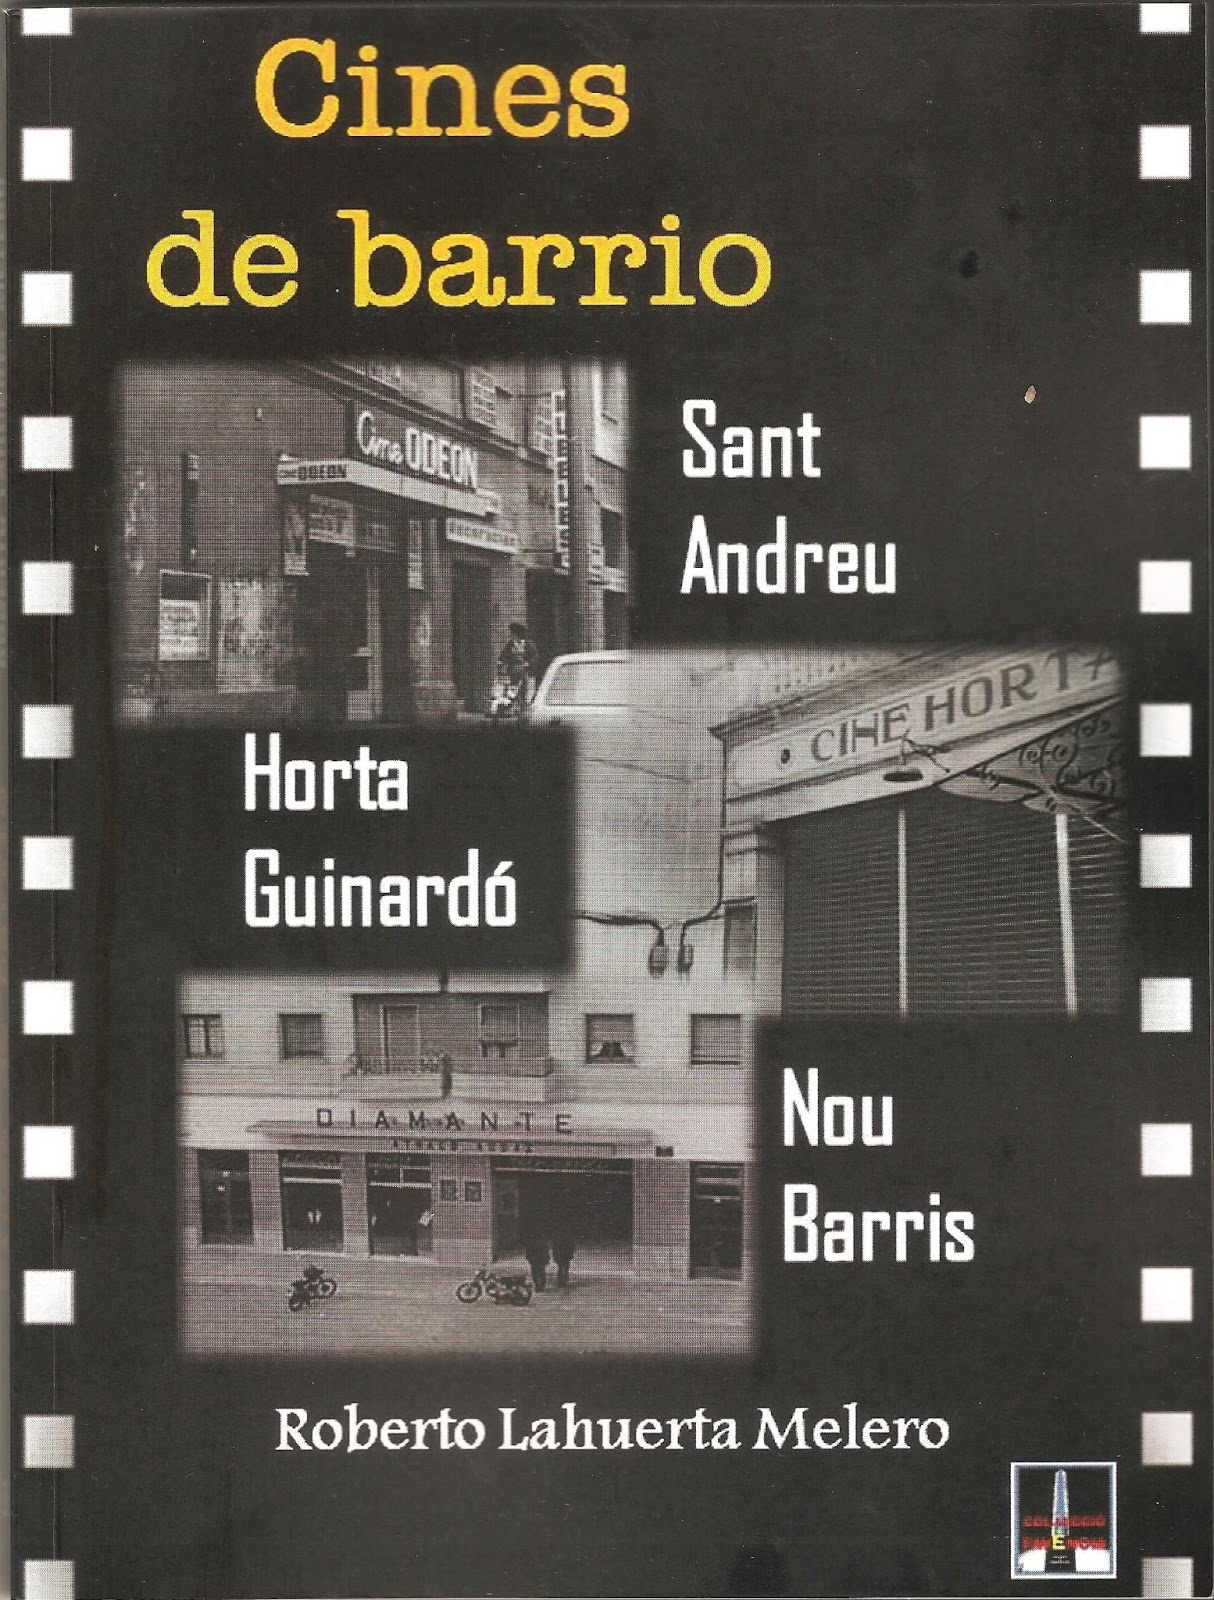 http://4.bp.blogspot.com/-FFYS0-pyzro/UWe1Bq_deoI/AAAAAAAACao/ETVHOOf6-Hw/s1600/Cines+de+Barrio.jpeg